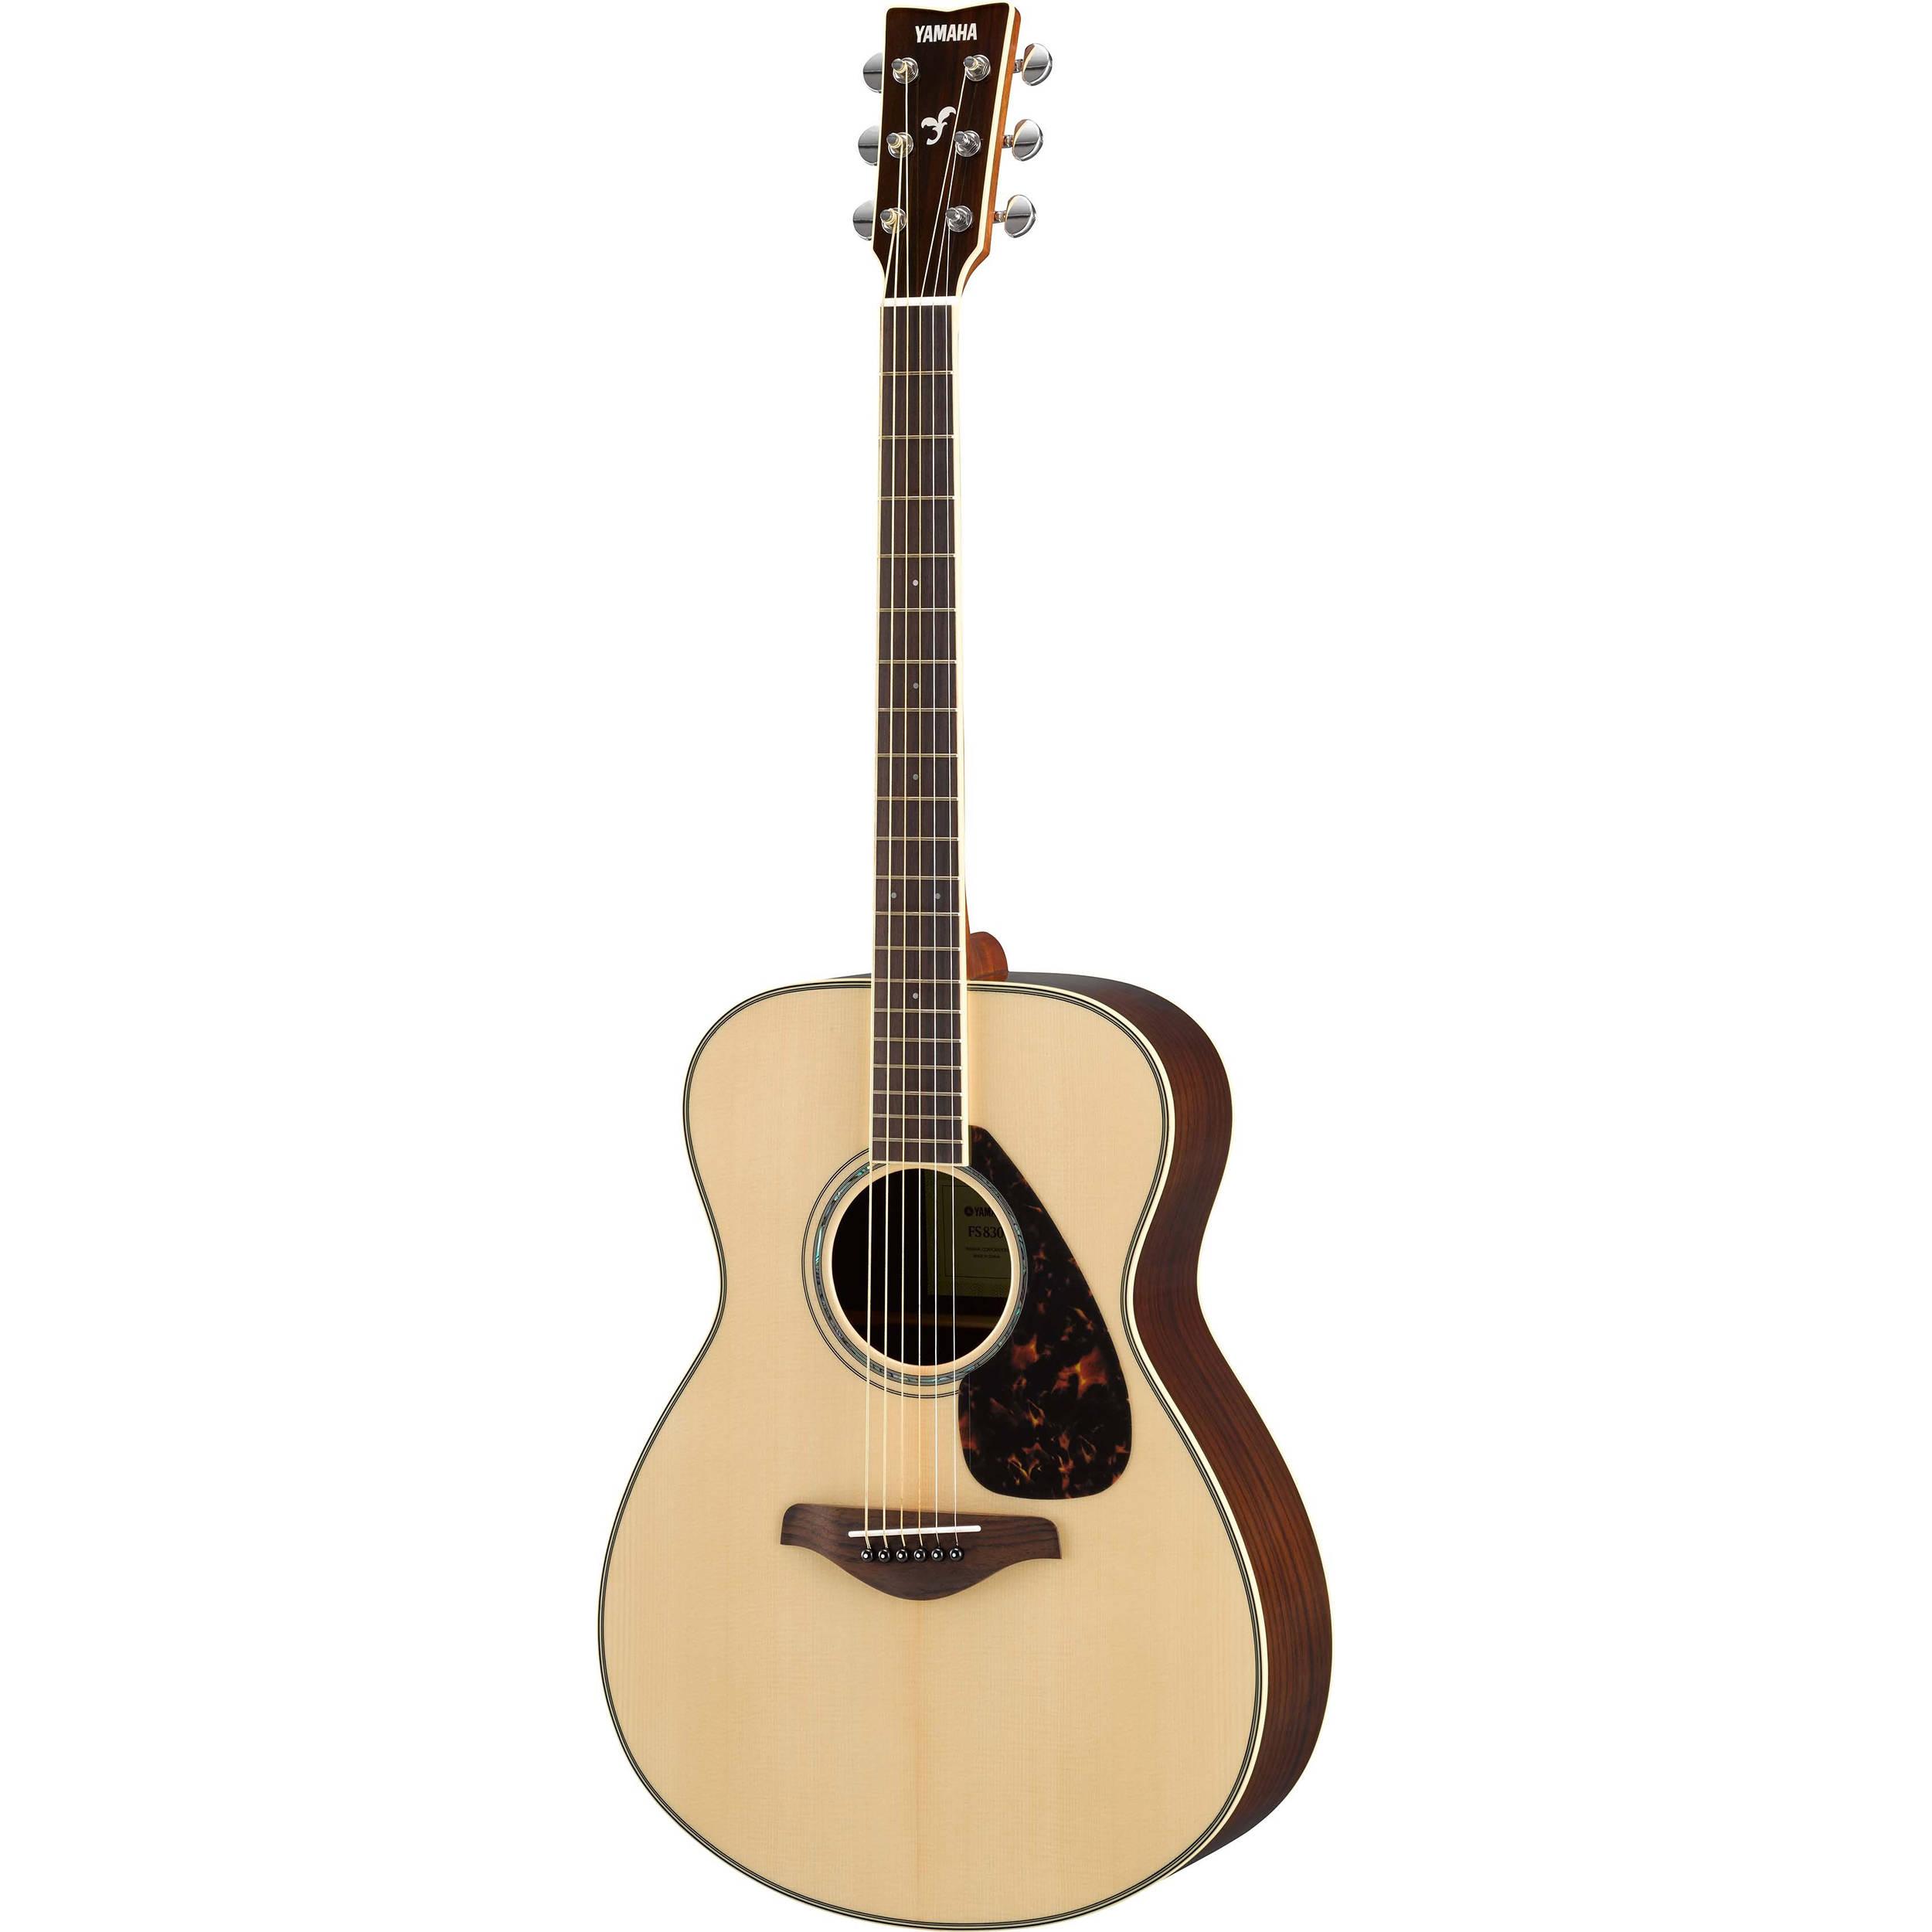 Yamaha fs830 fs series concert style acoustic guitar fs830 b h for Yamaha fs 310 guitar